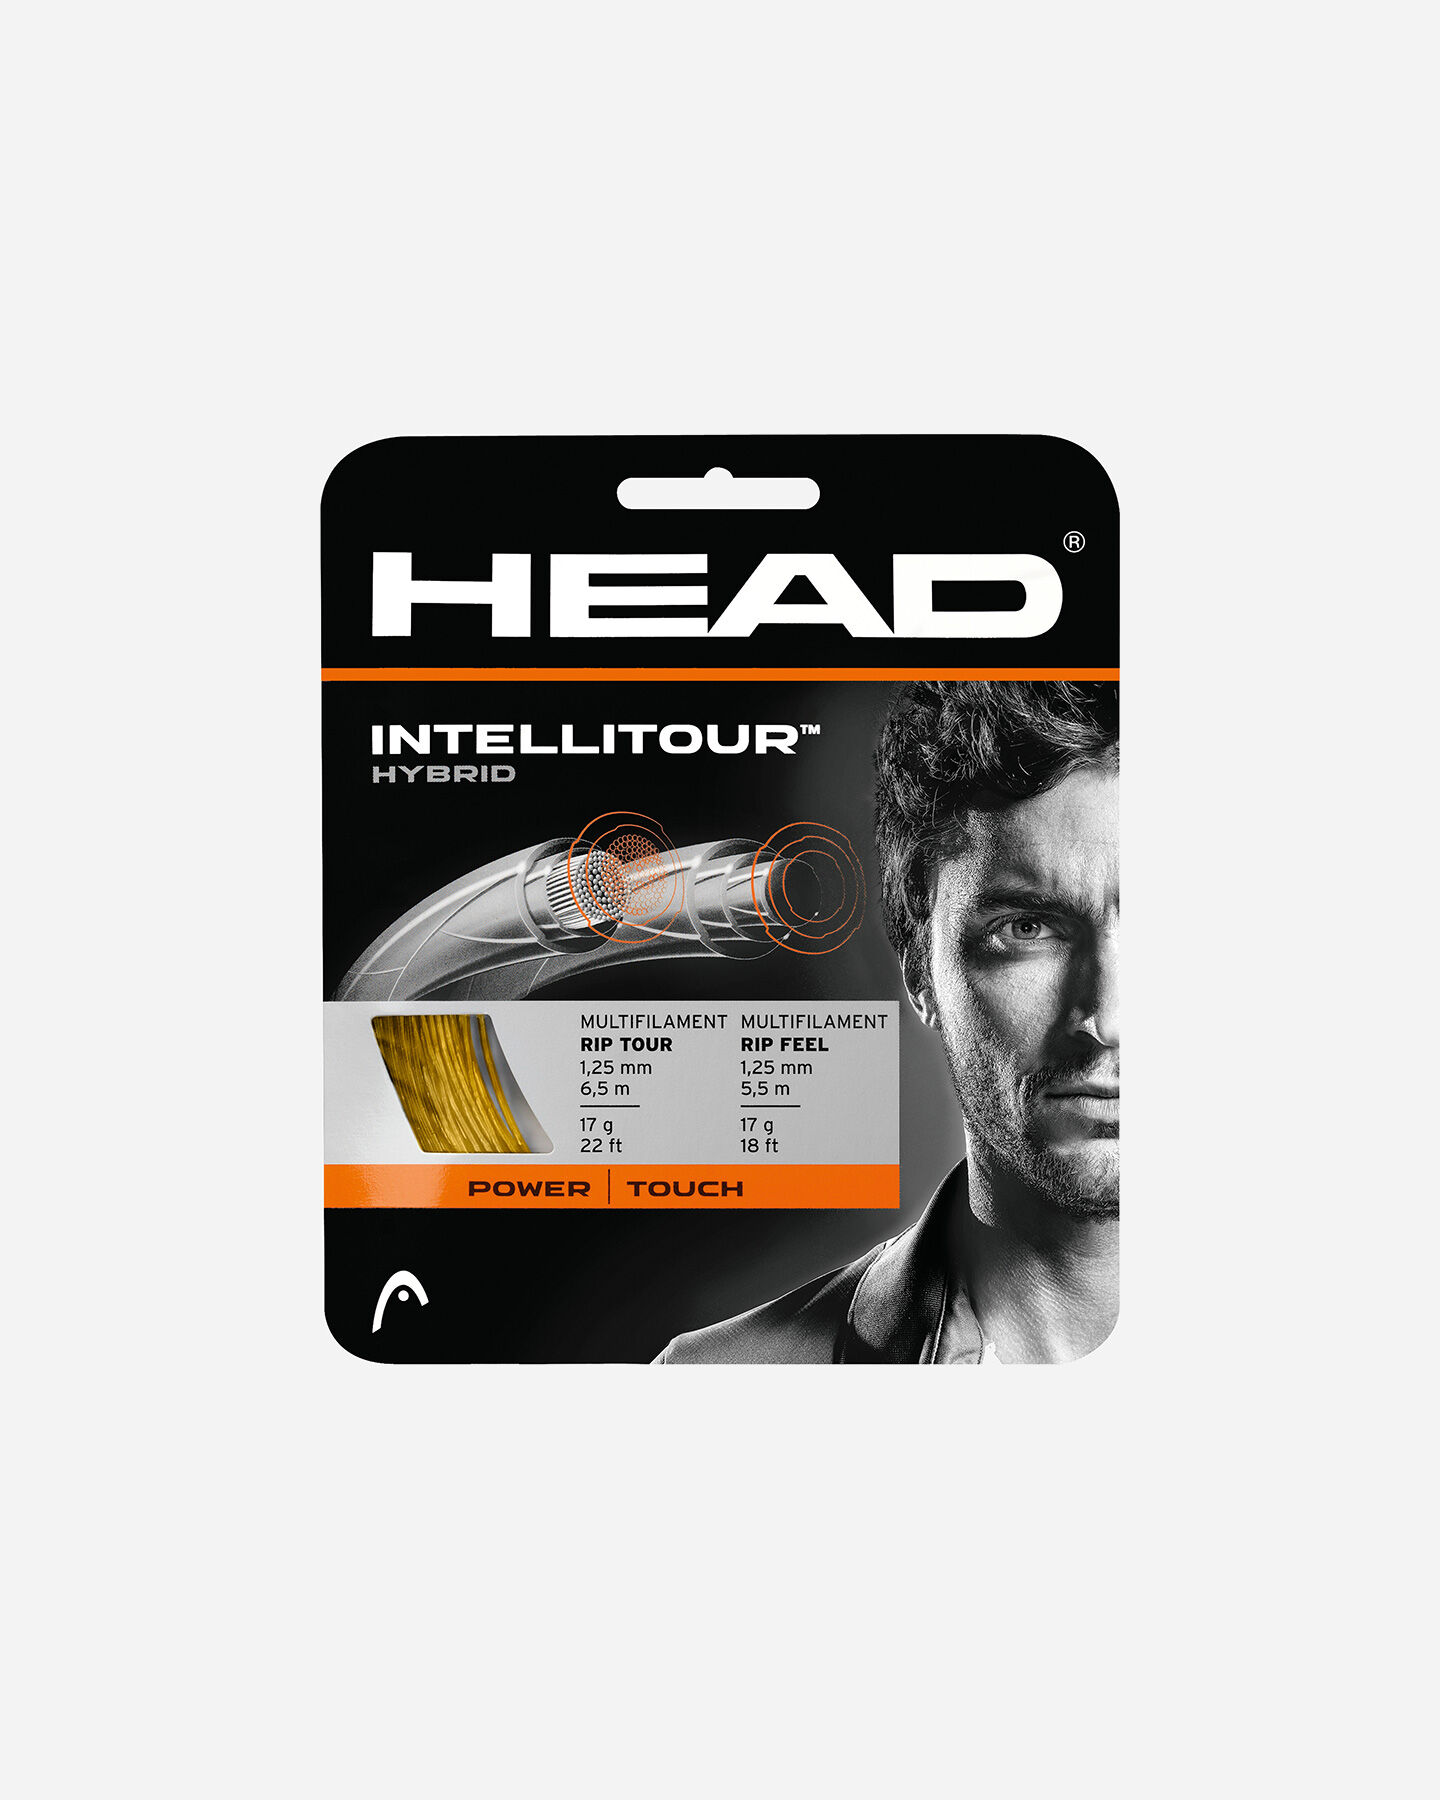 Corde tennis HEAD SET INTELLITOUR CALIBRO 1,30 S5220963 NT 16 scatto 0